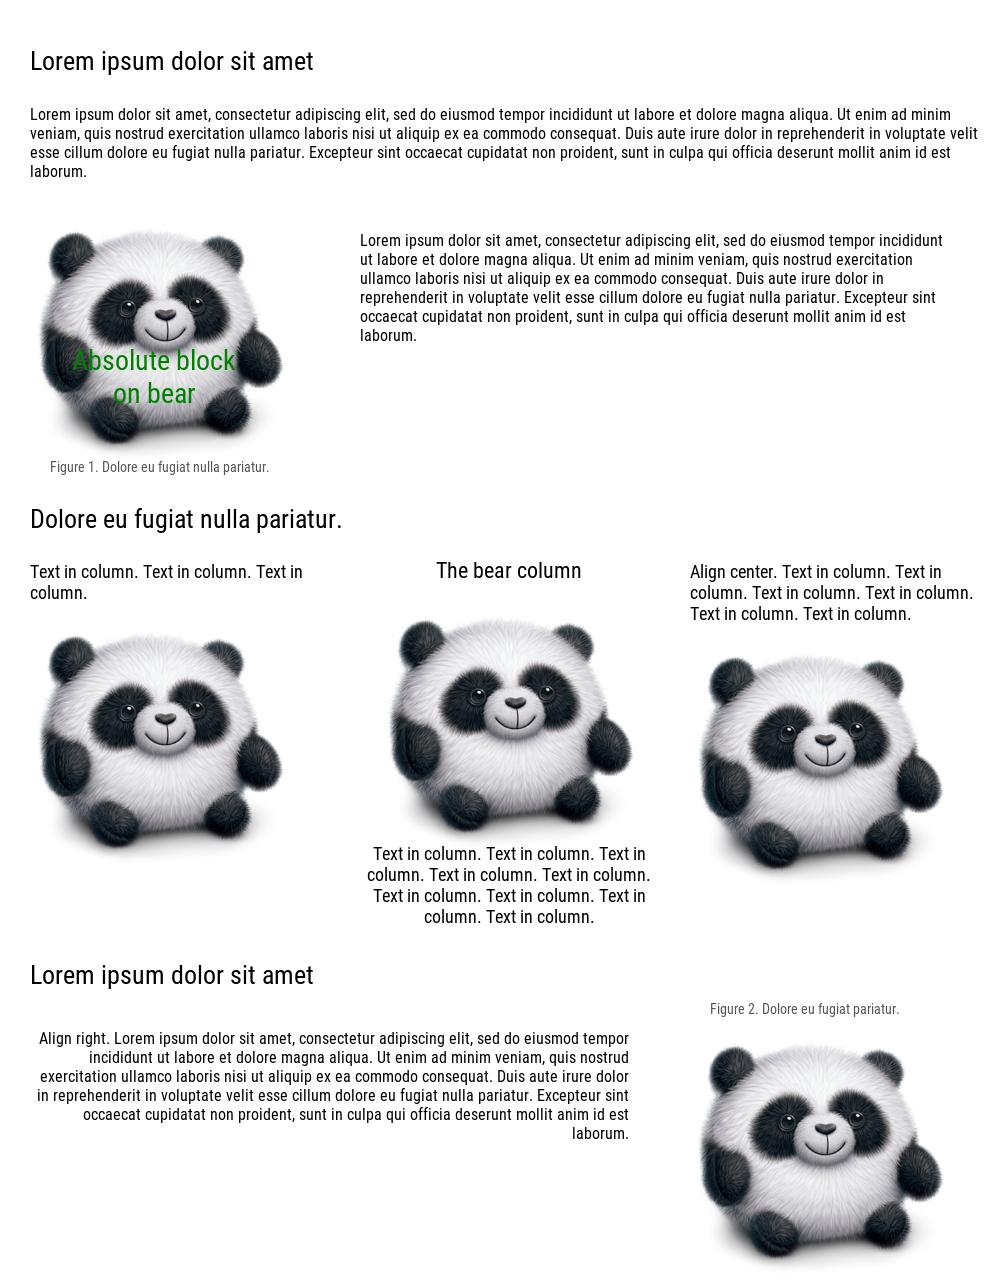 idg - геренартор картинок ( быстрее чем html->pdf->image )